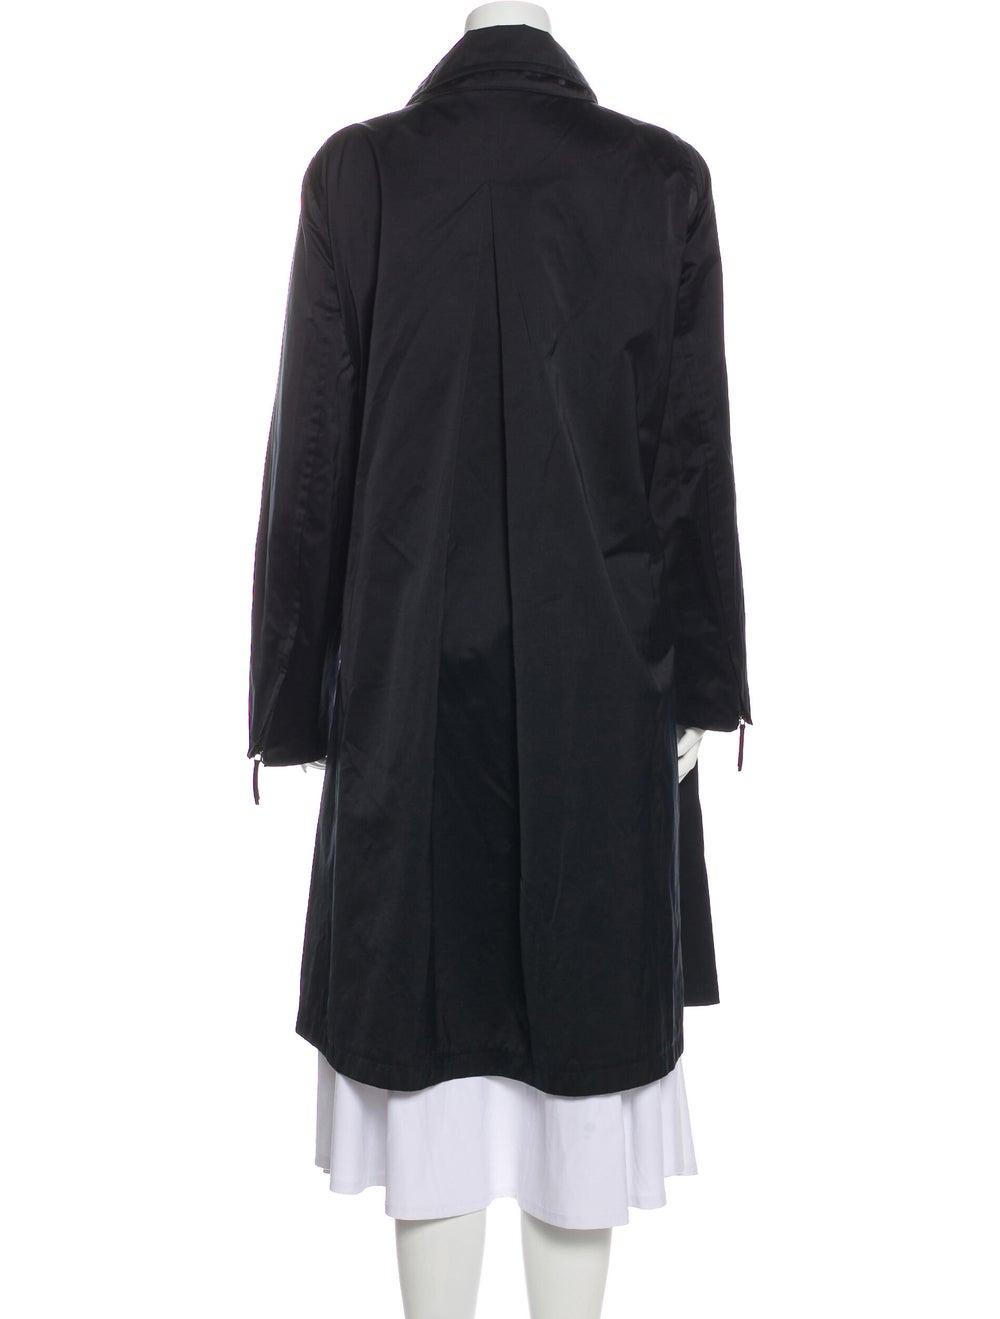 Max Mara Coat Black - image 3